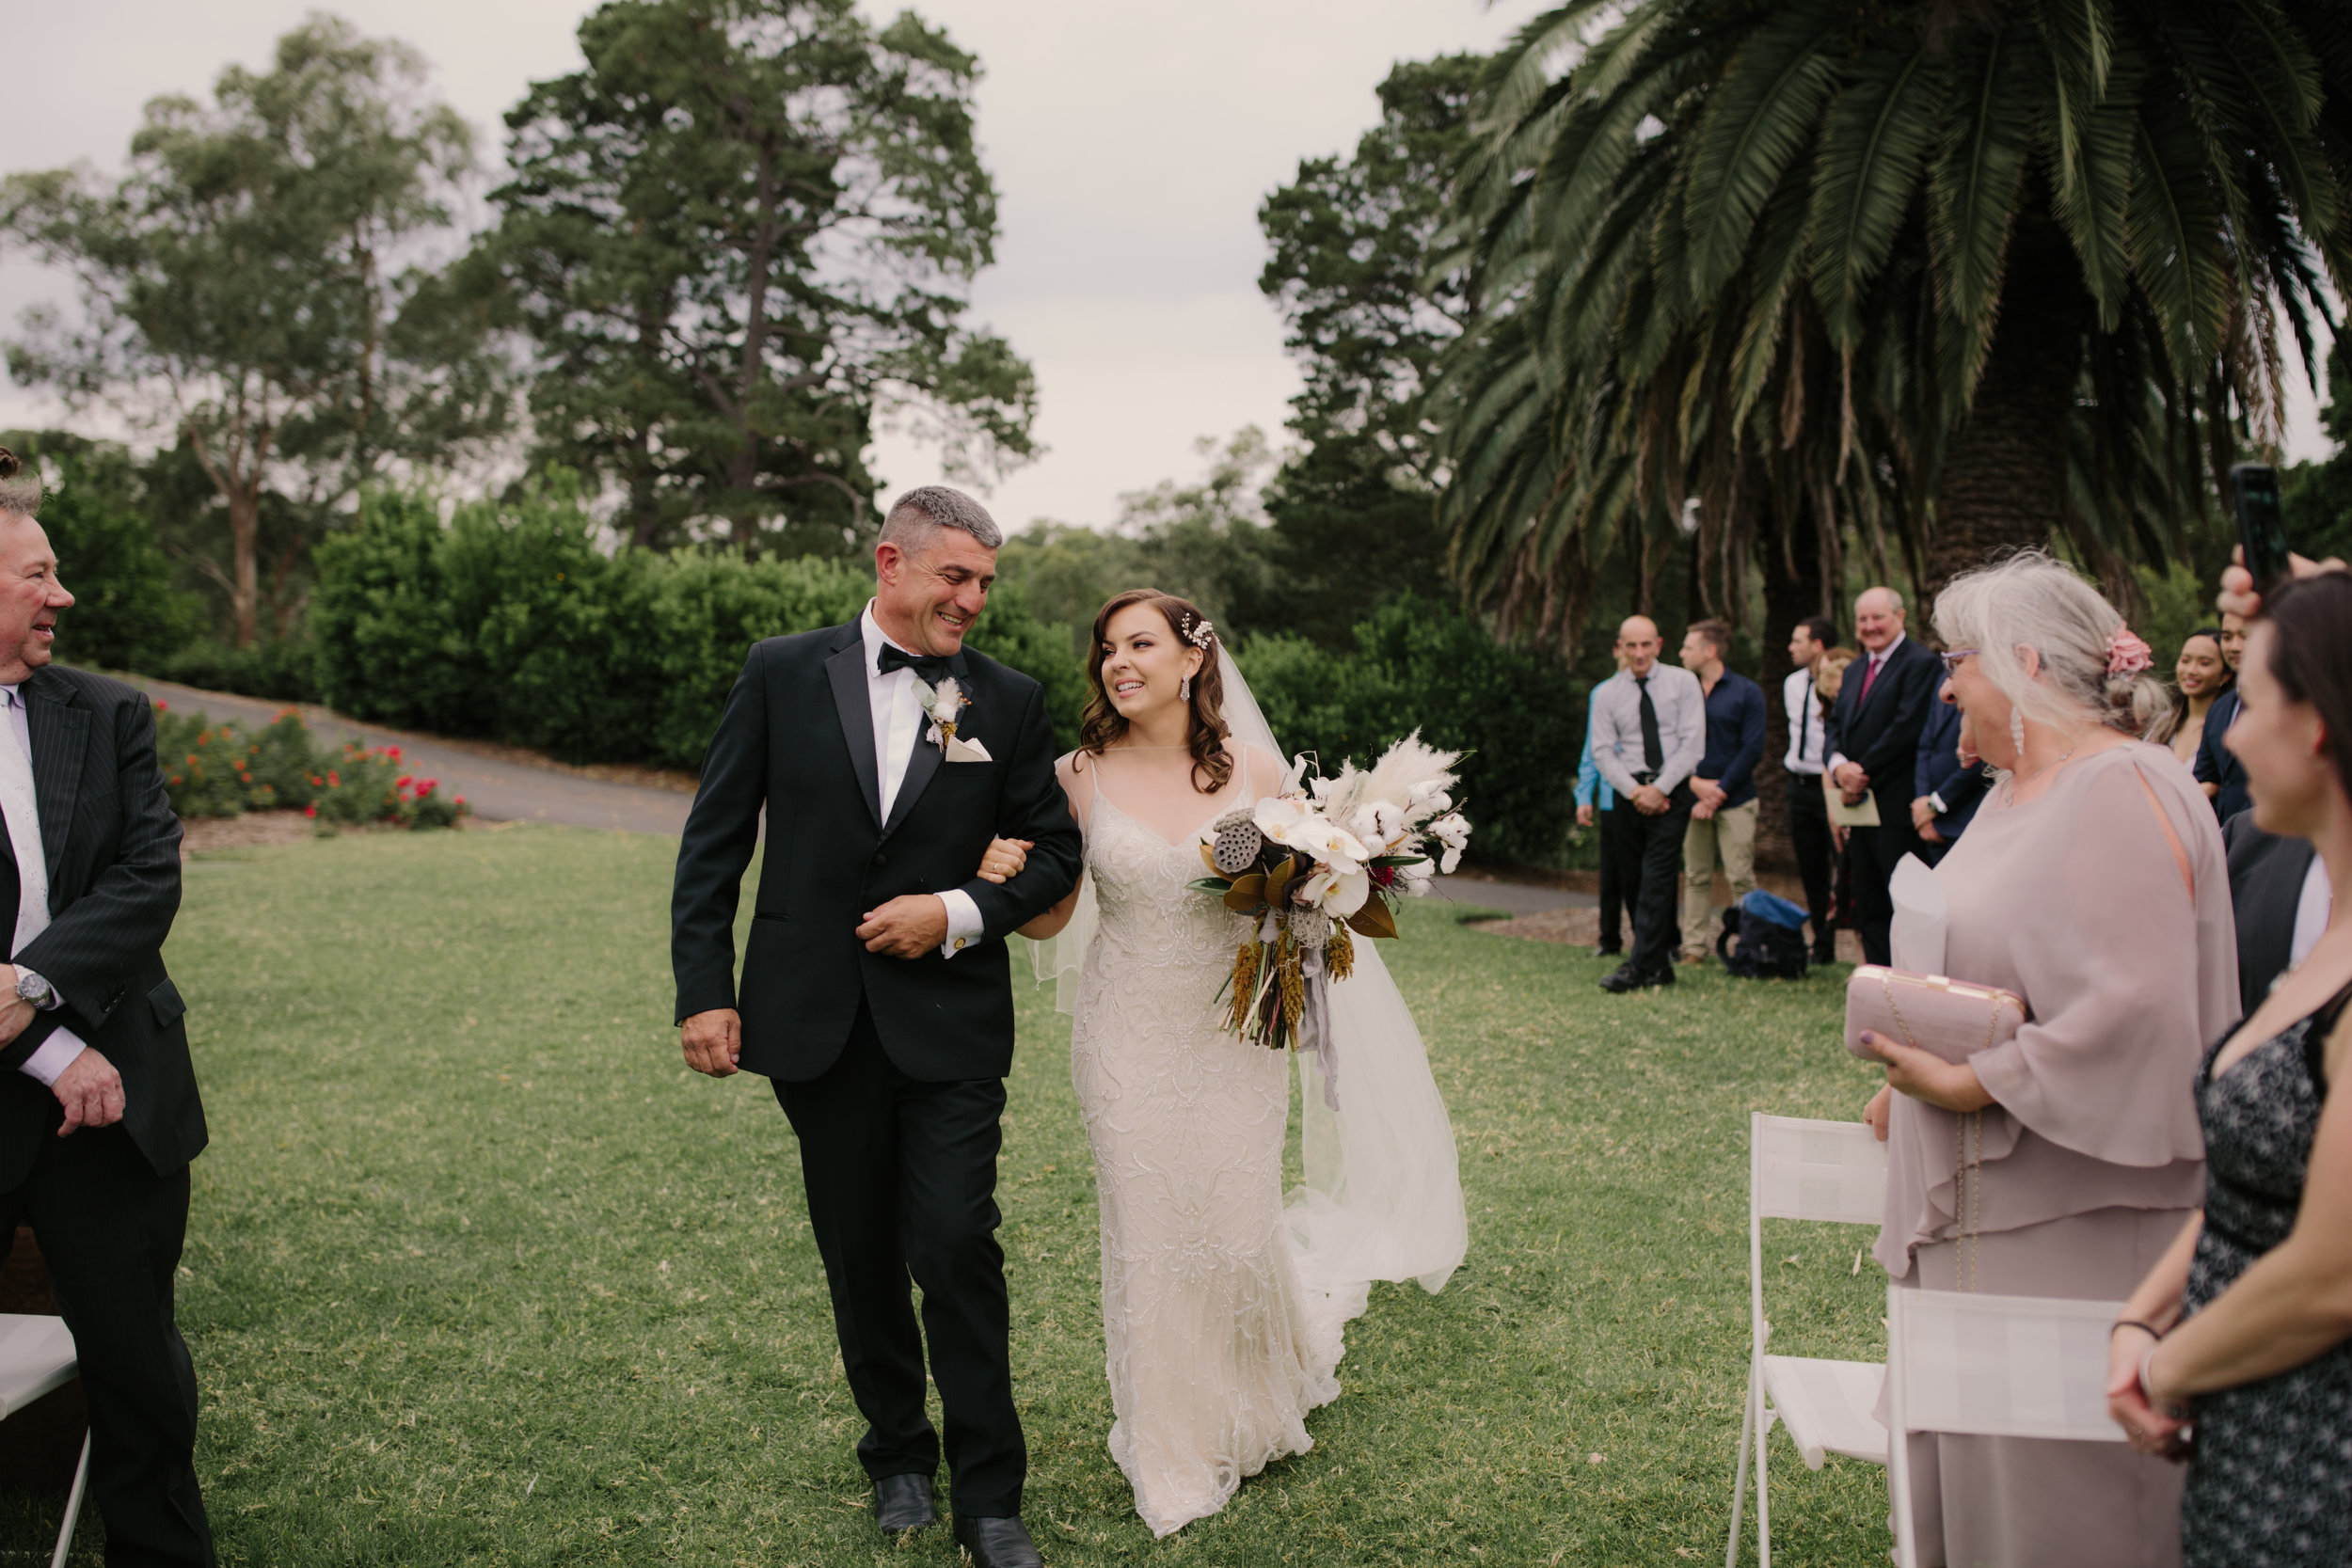 I-Got-You-Babe-Weddings-Melanie-Isaac0381.JPG